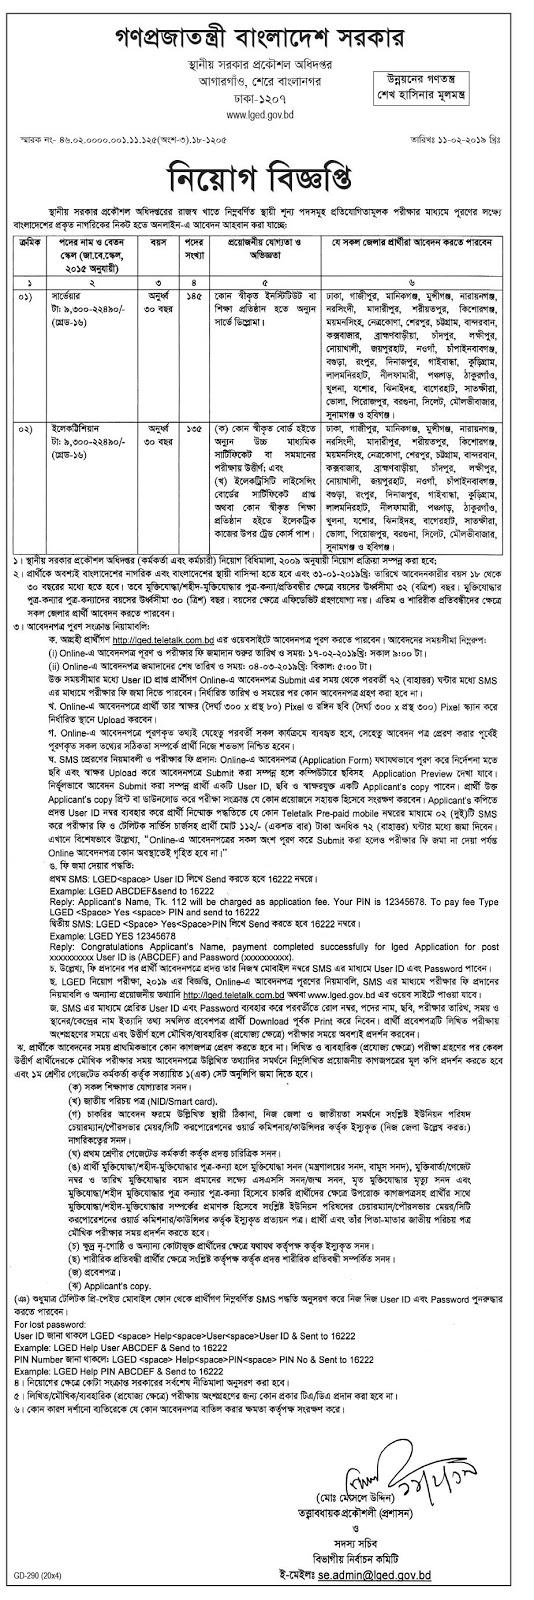 Local Government Engineering Departmen(LGED) job circular 2019 Apply online